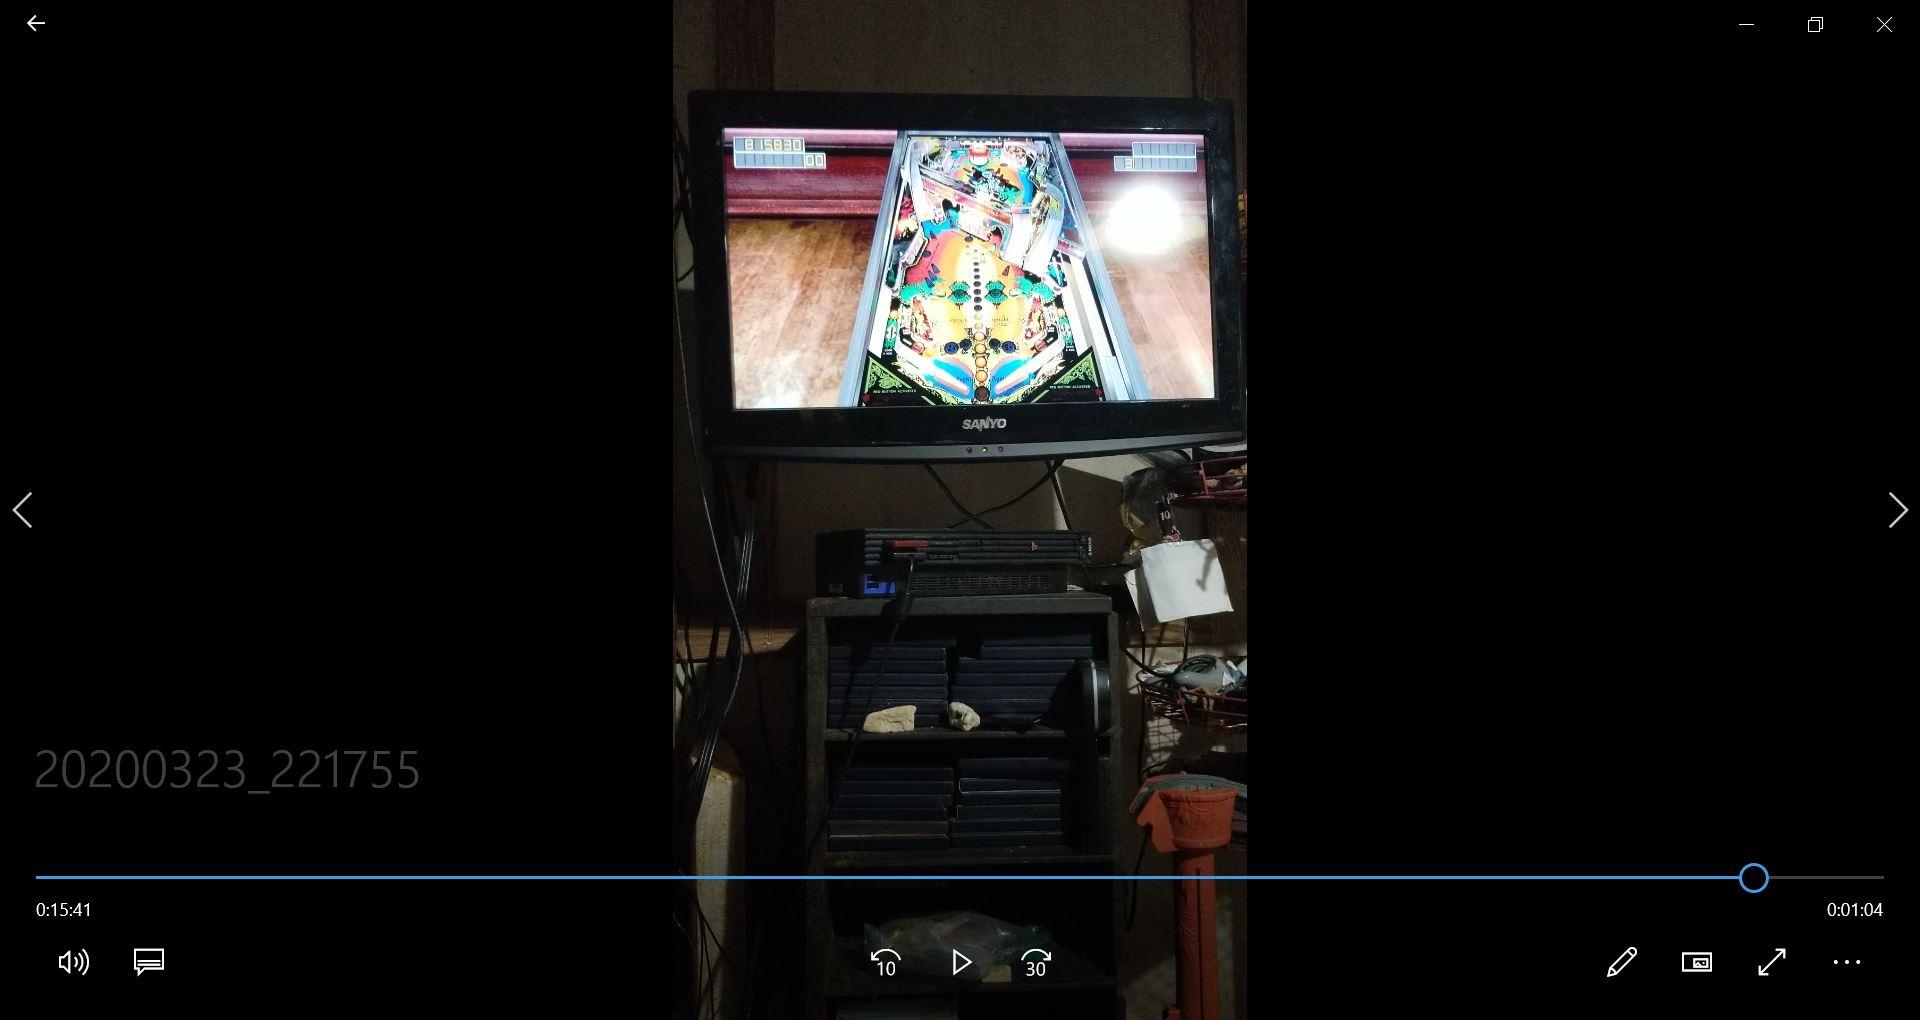 speedy4759123: Pinball Arcade: Black Knight (Playstation 4) 815,830 points on 2020-03-24 09:46:38